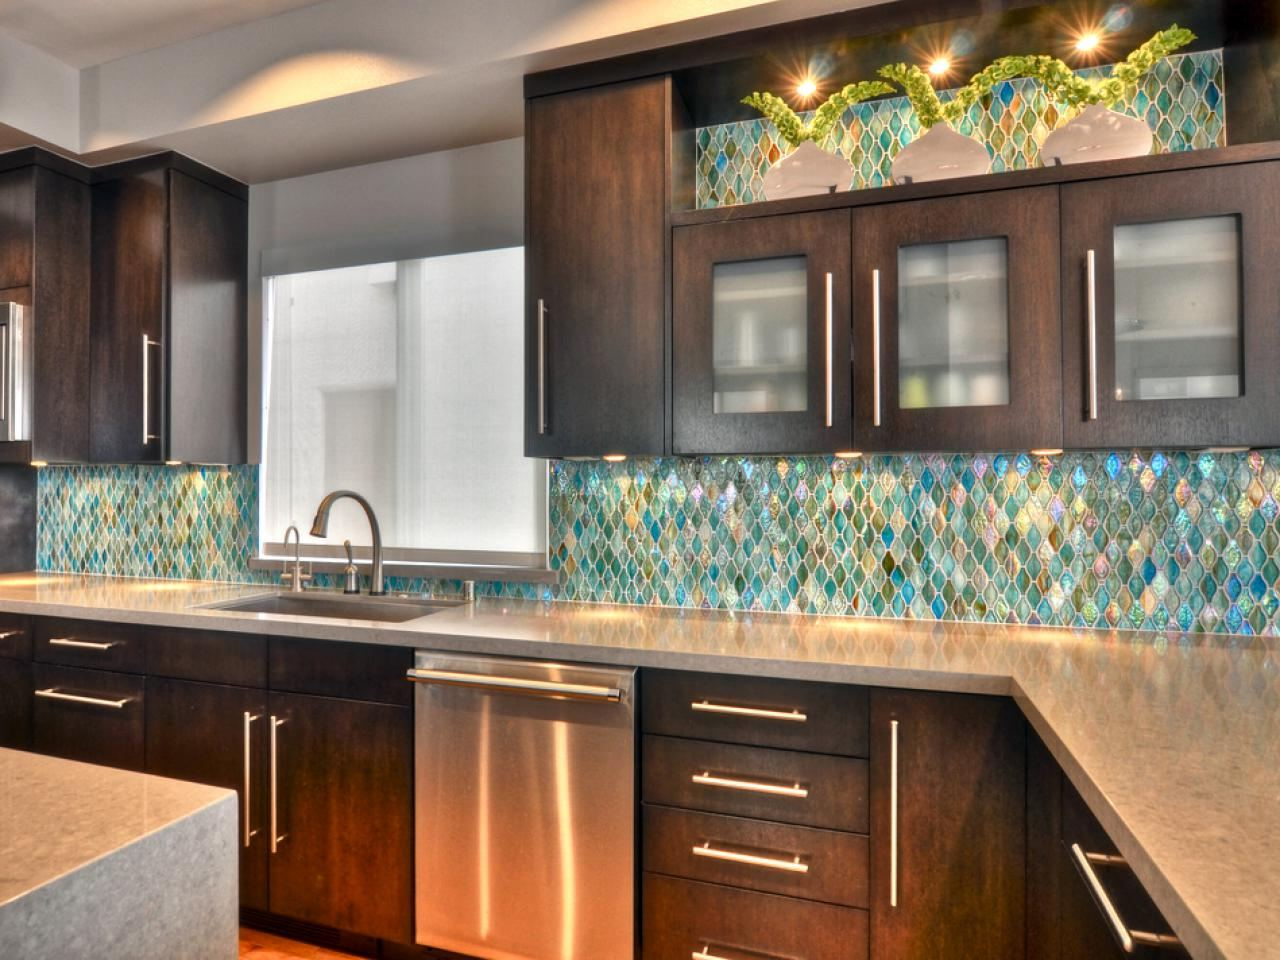 stone tile kitchen countertops. Mosaic Tile Backsplash \u2013 Best Stone Veneer For Kitchen Countertops